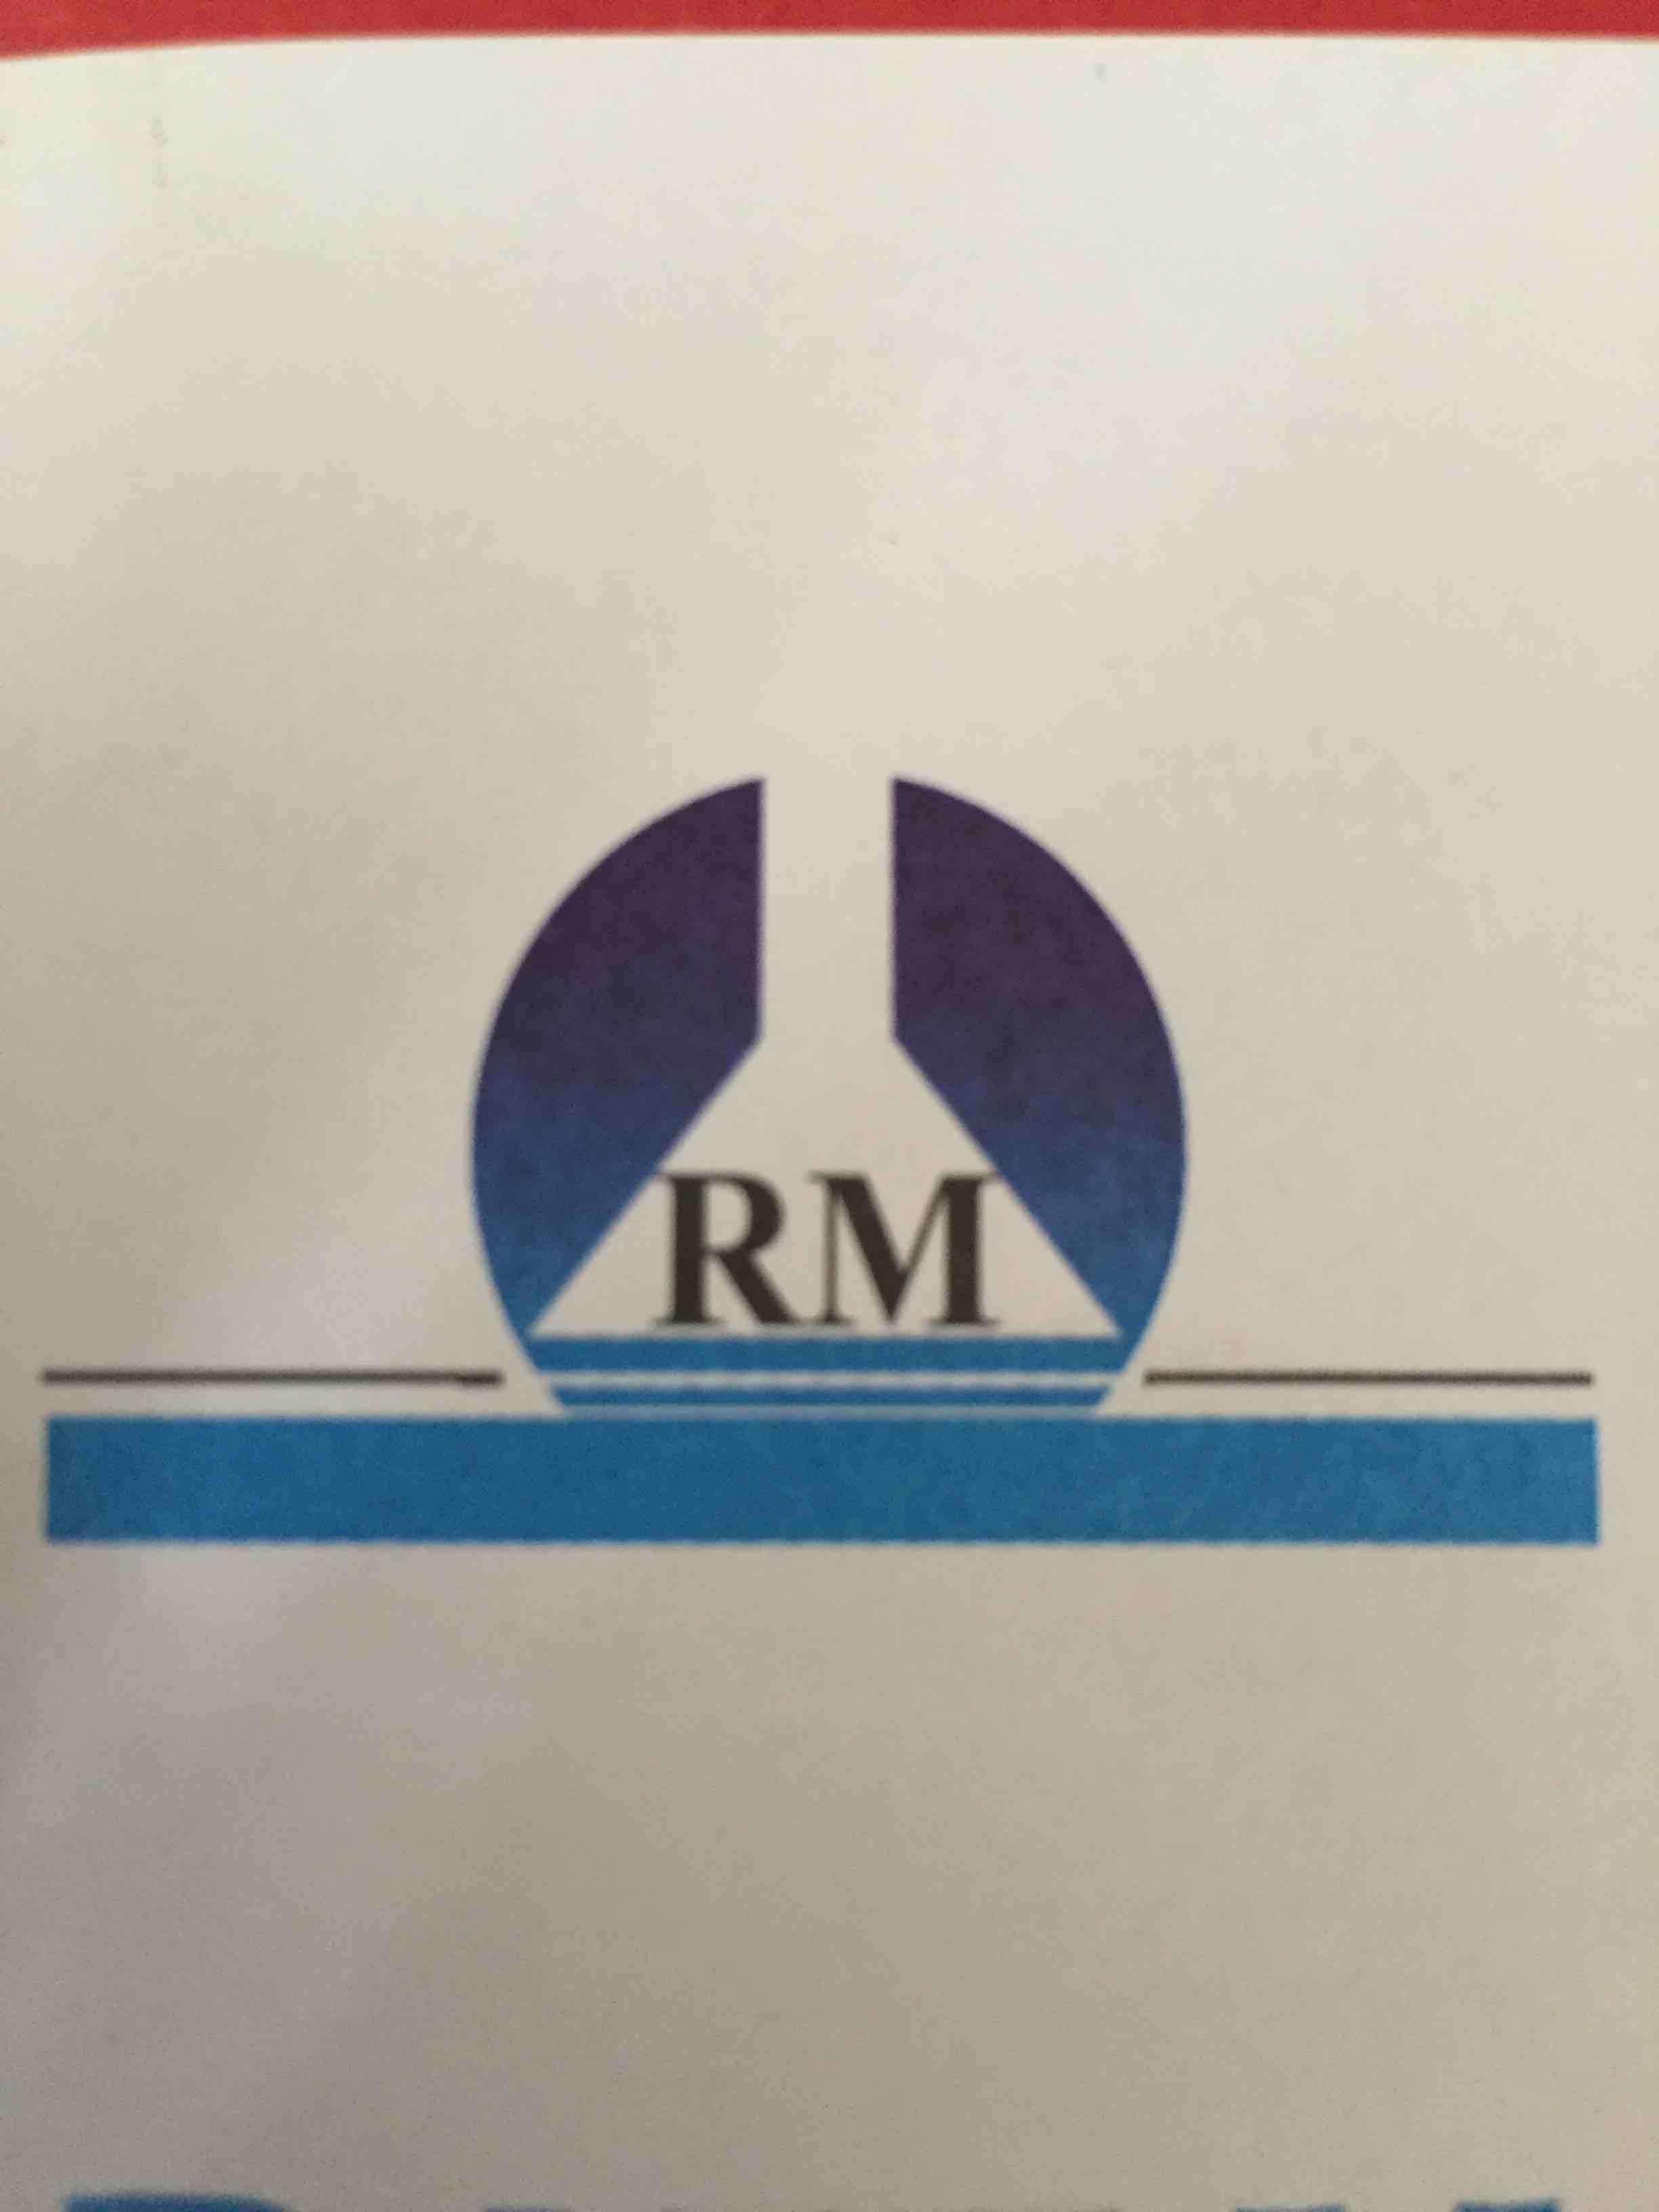 Ravi Marketing - logo